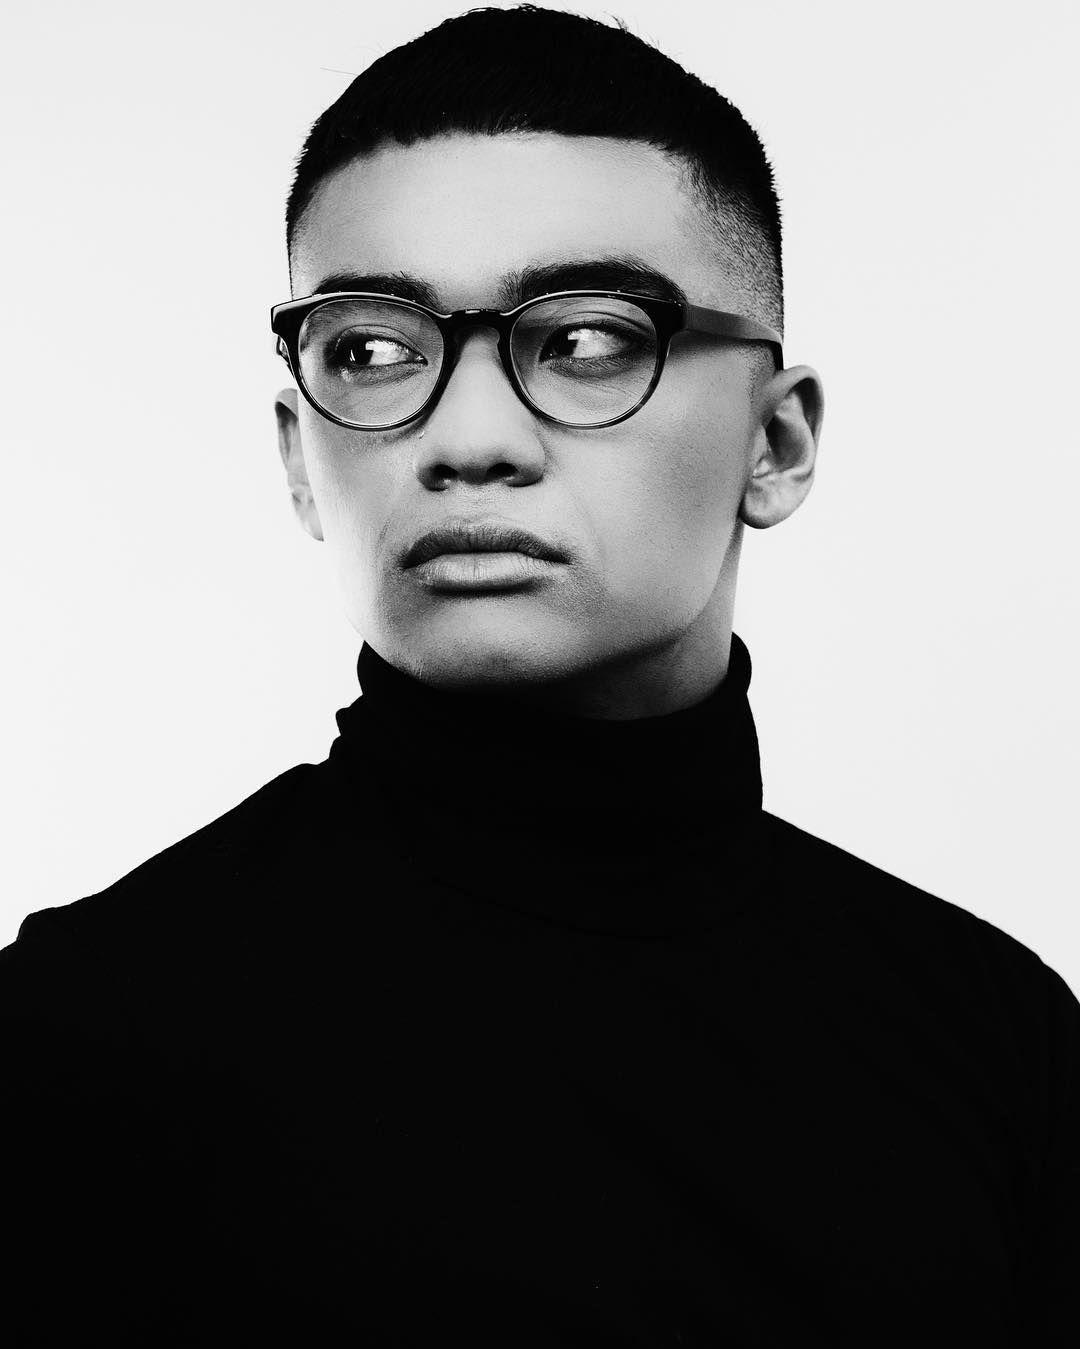 Menus Hairstyles   Haircut  Pinterest  Low fade Asian hair